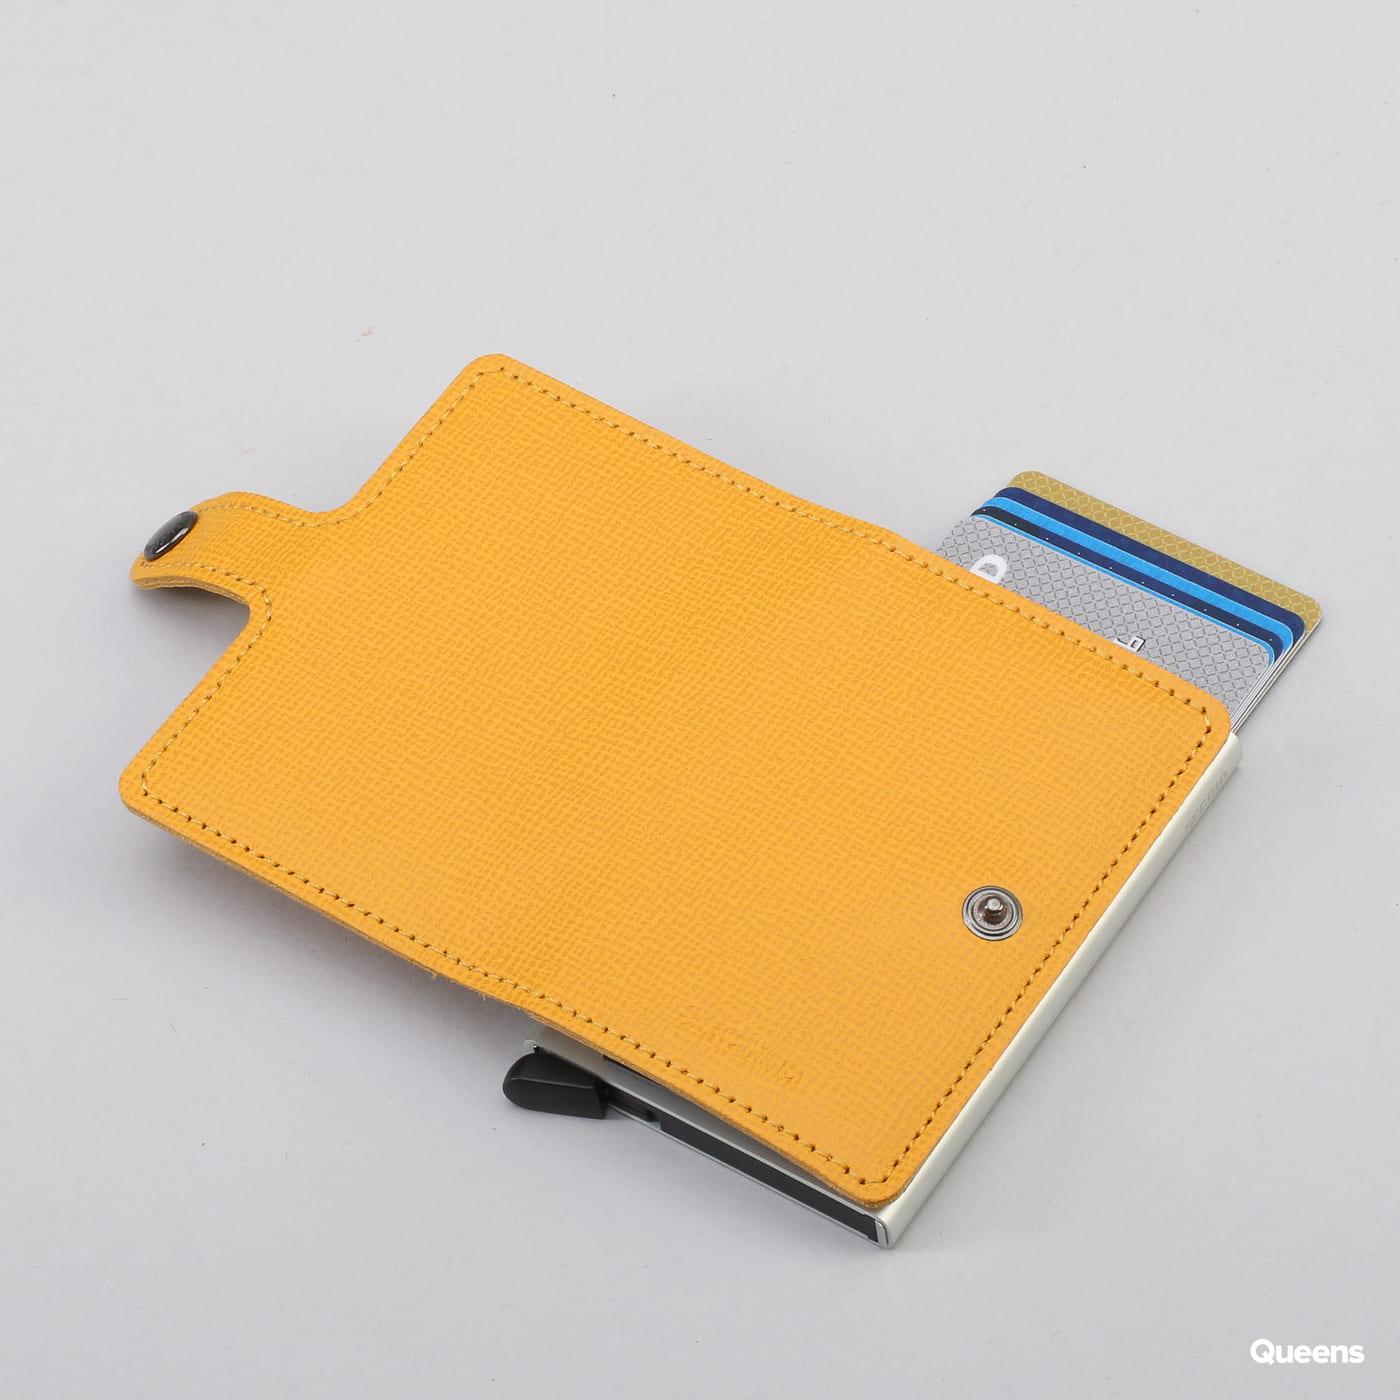 SECRID Miniwallet Crisple gelb / grau